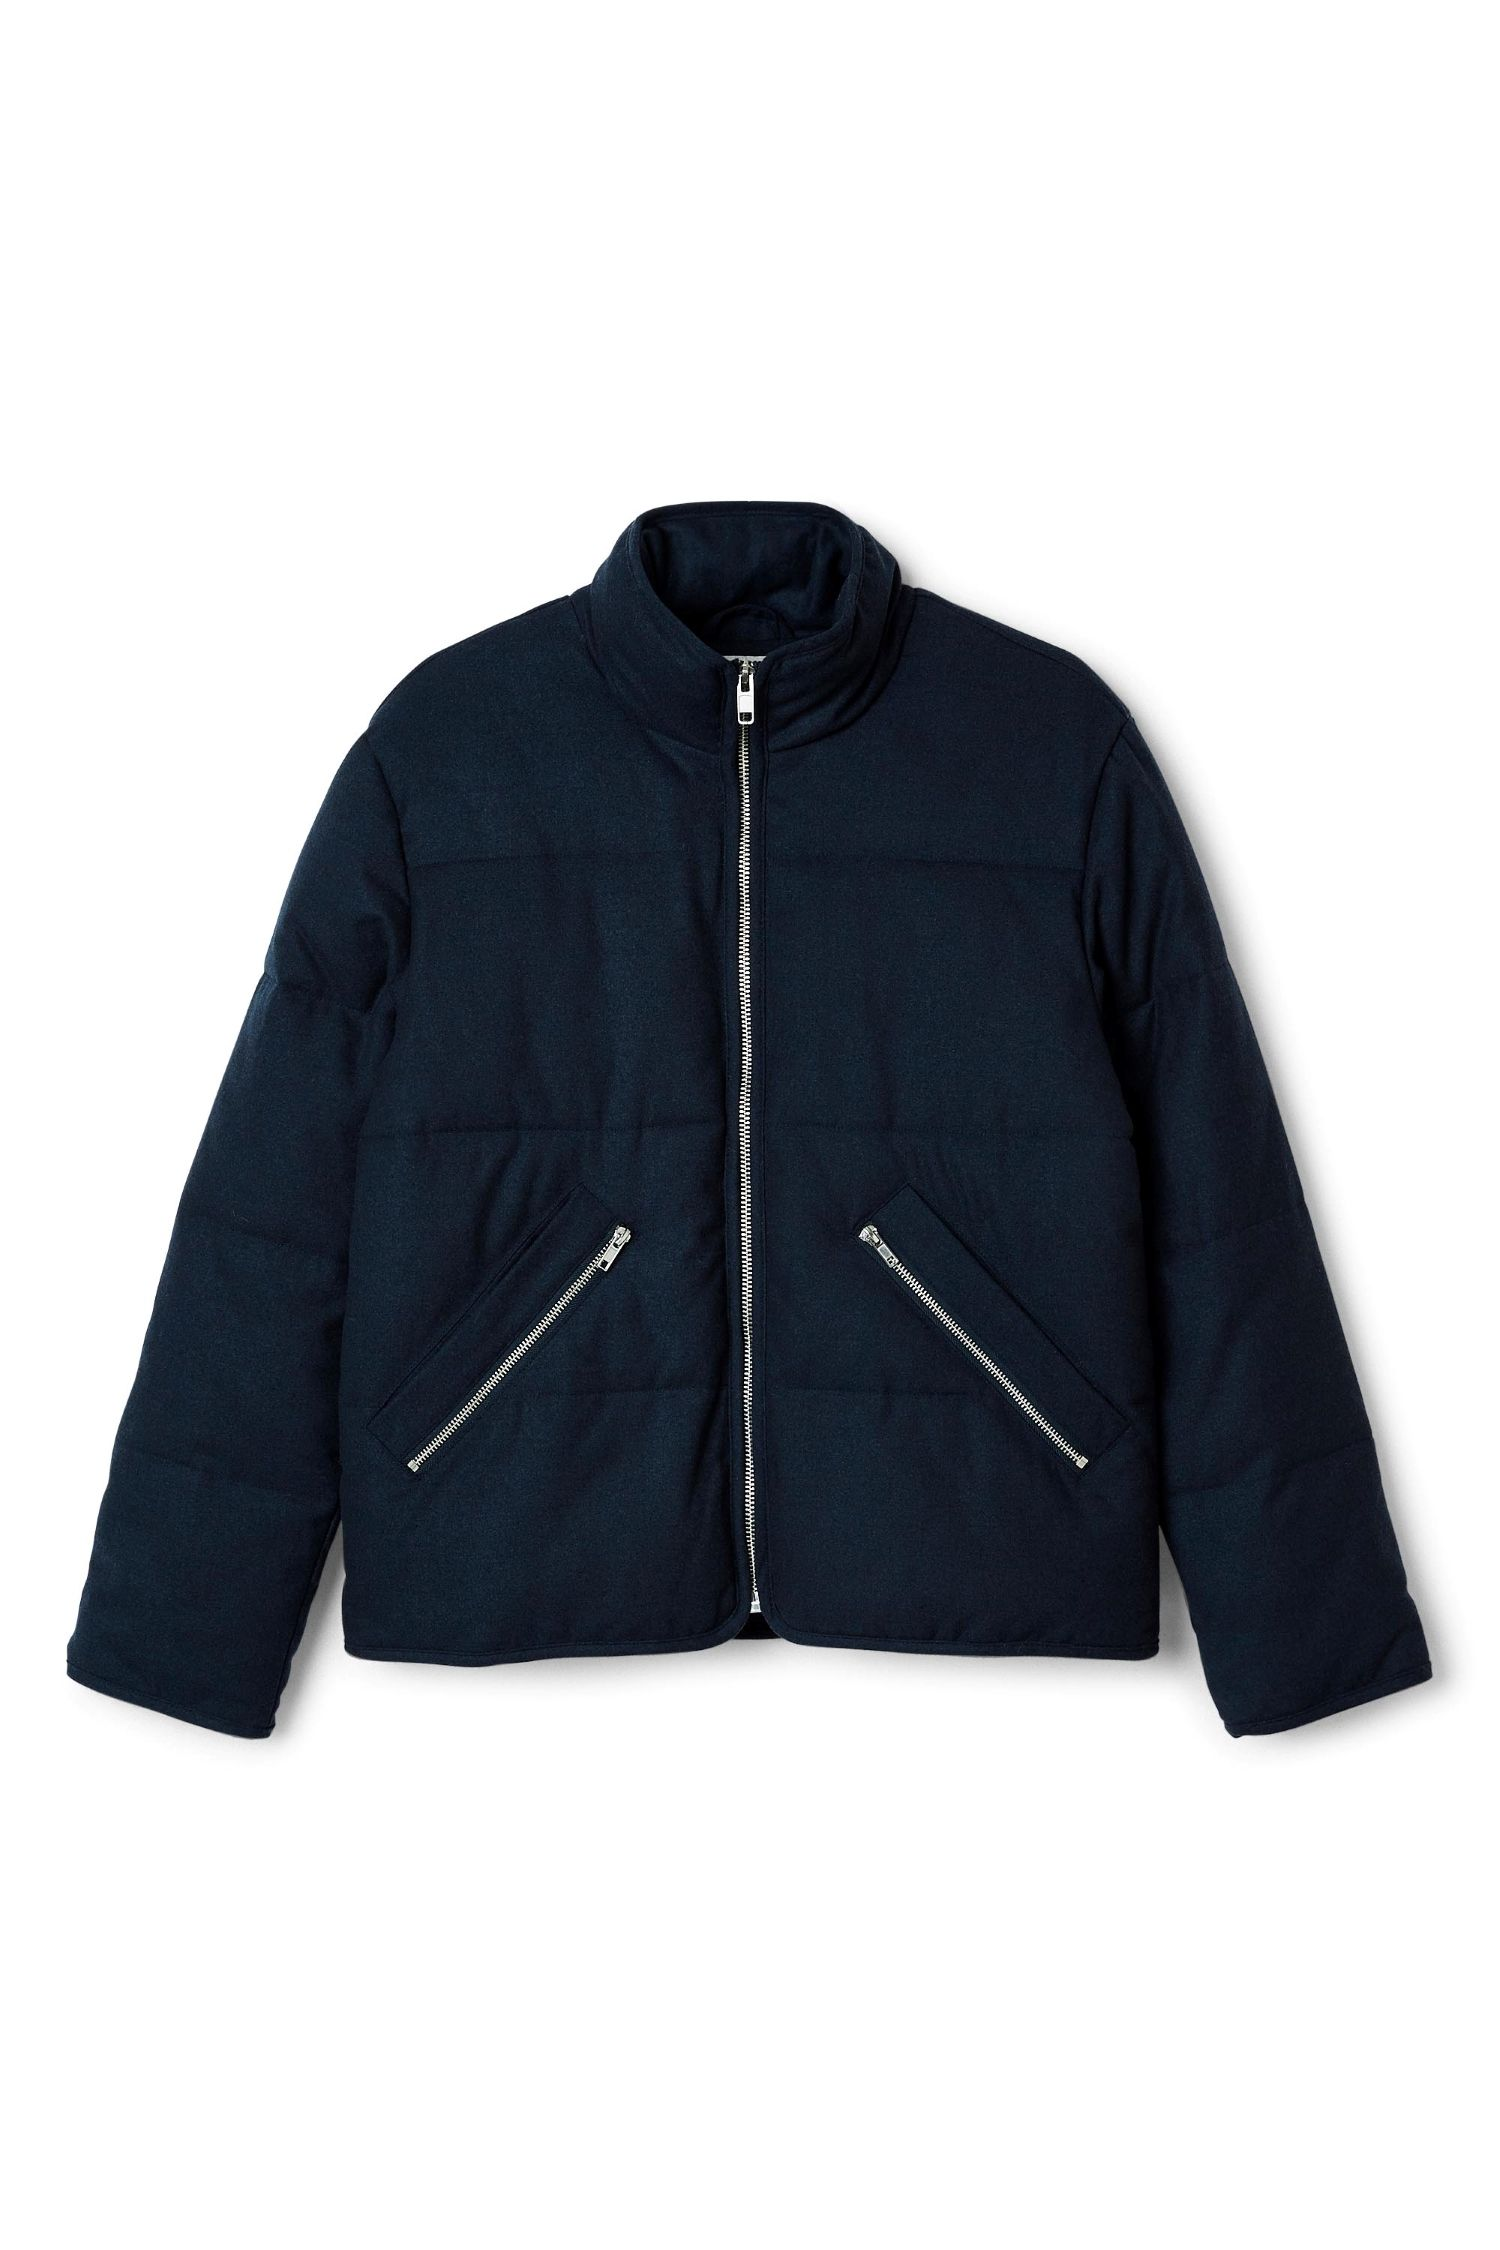 Weekday Image 4 Of Woom Jacket In Blue Dark Fashion Clothes Design Jackets [ 2250 x 1500 Pixel ]